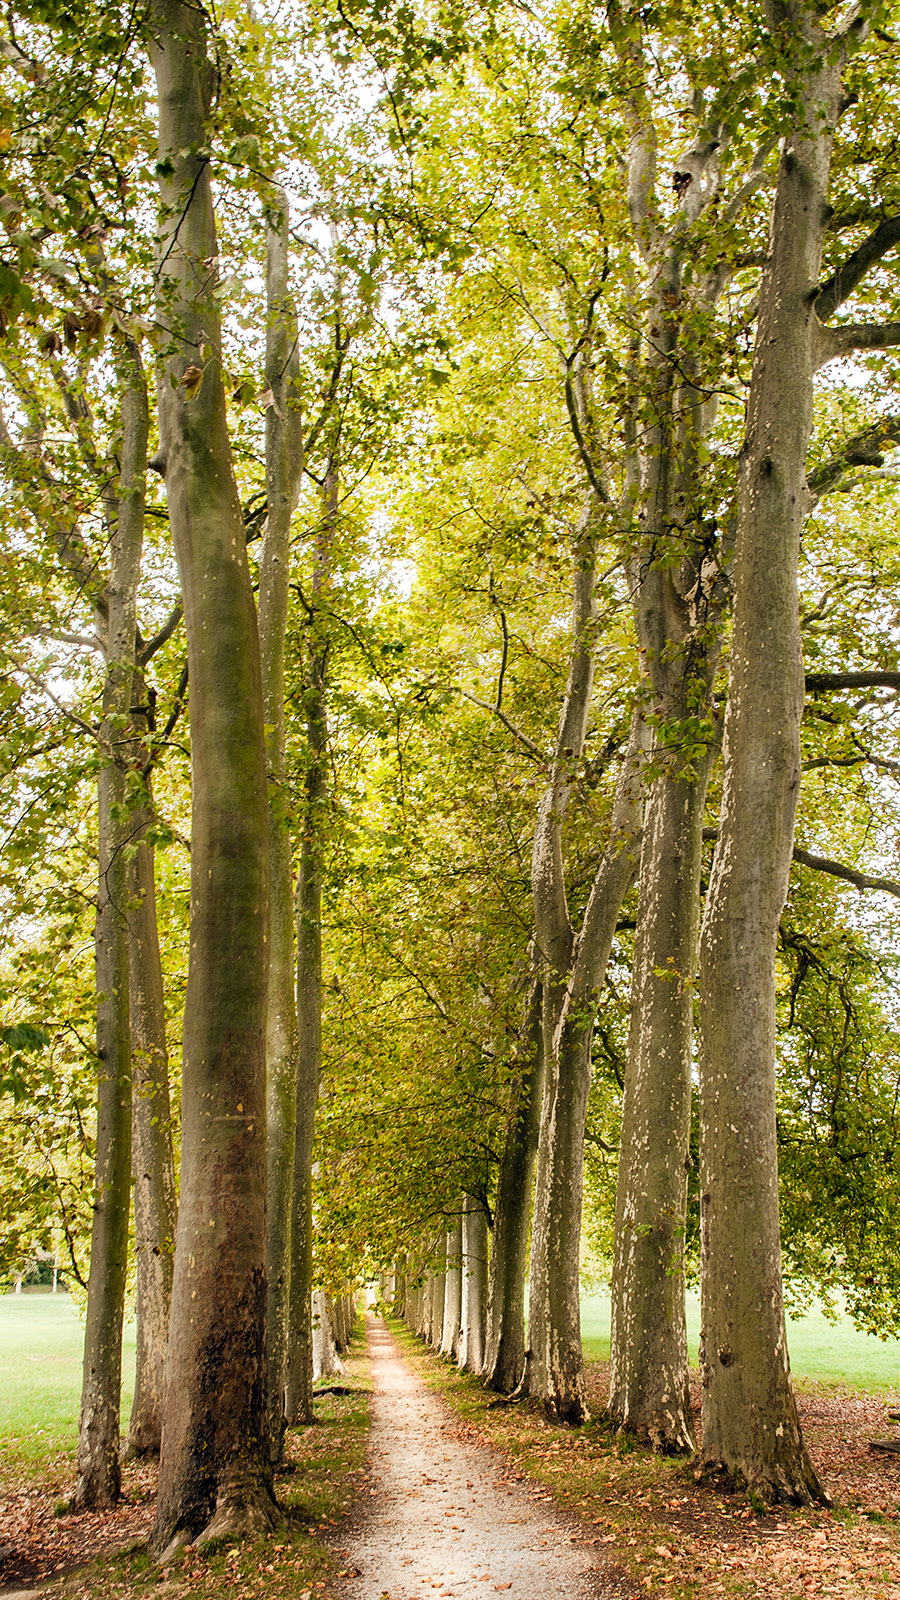 Canal du Midi: 62 Platanen, alle mehr als 40 m hoch, schmücken den Park an der Écluse de l'Océan. Foto: Hilke Maunder